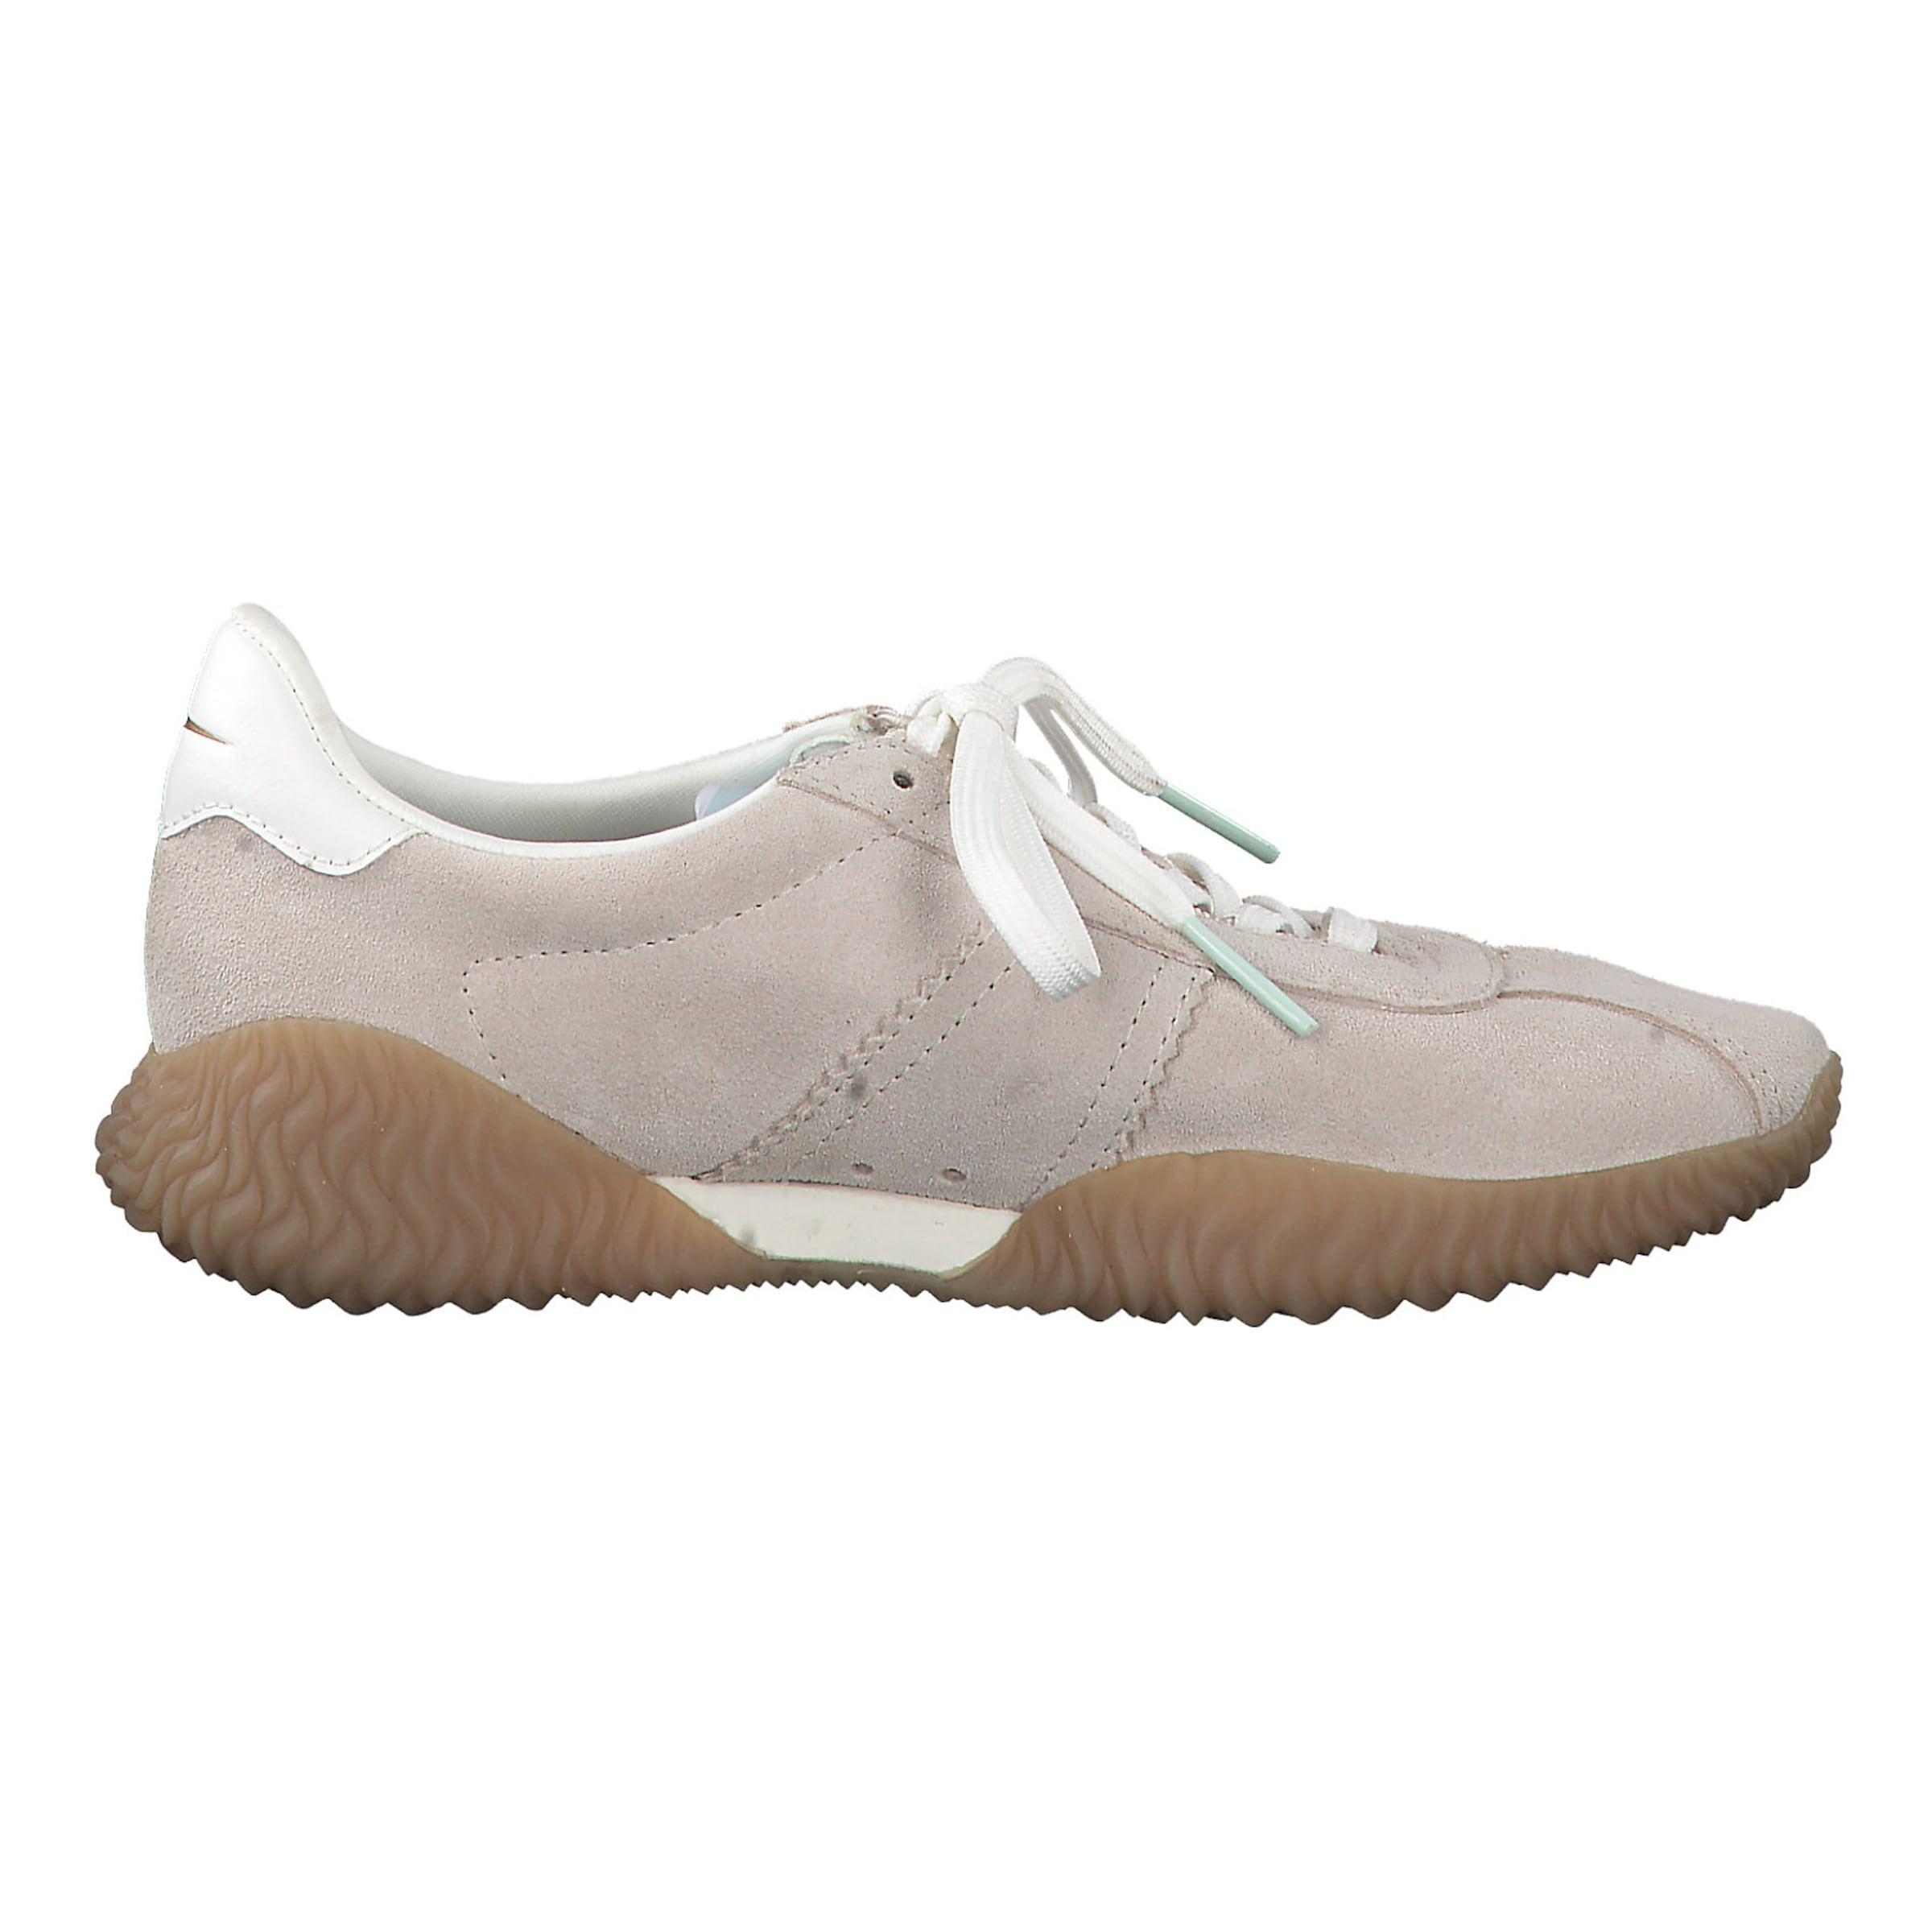 Tamaris In PuderNaturweiß In PuderNaturweiß Sneakers Tamaris In Tamaris Sneakers Sneakers A3j54LqR